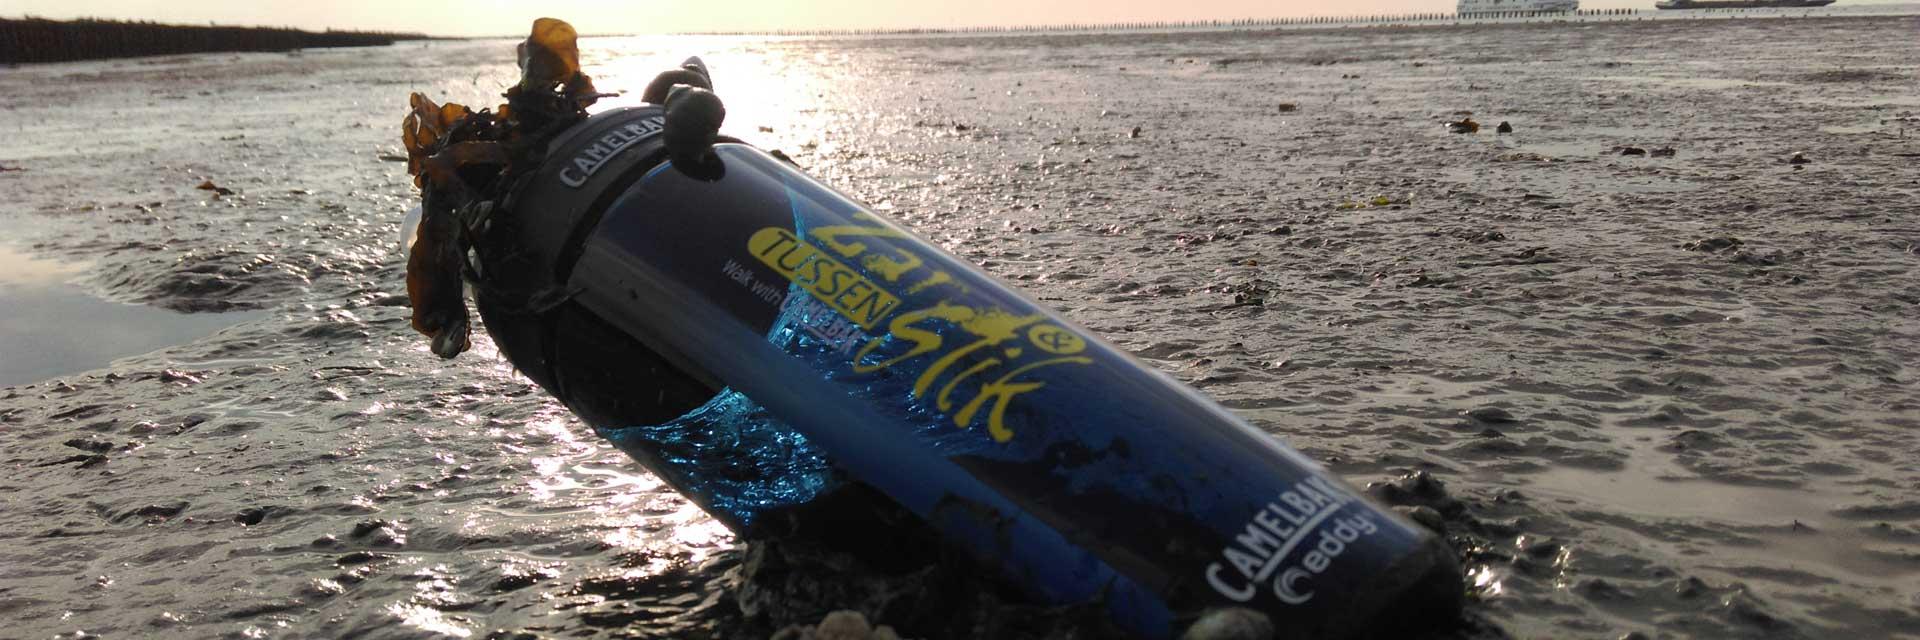 Tussen Slik en Zand: Drinkfles van CamelBak in het slik van Ameland